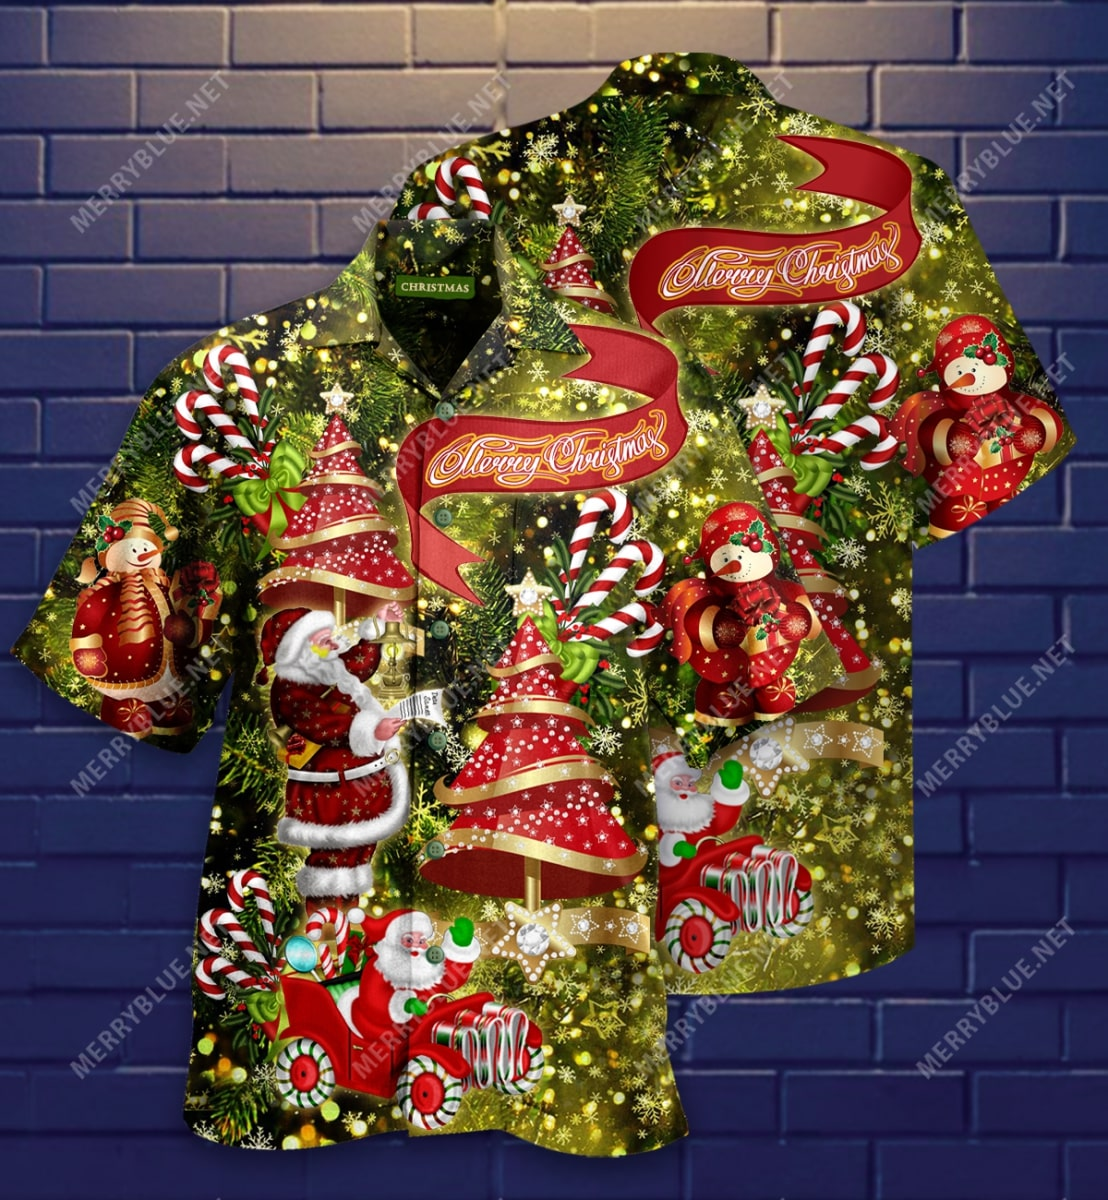 believe in magic of christmas full printing hawaiian shirt 3